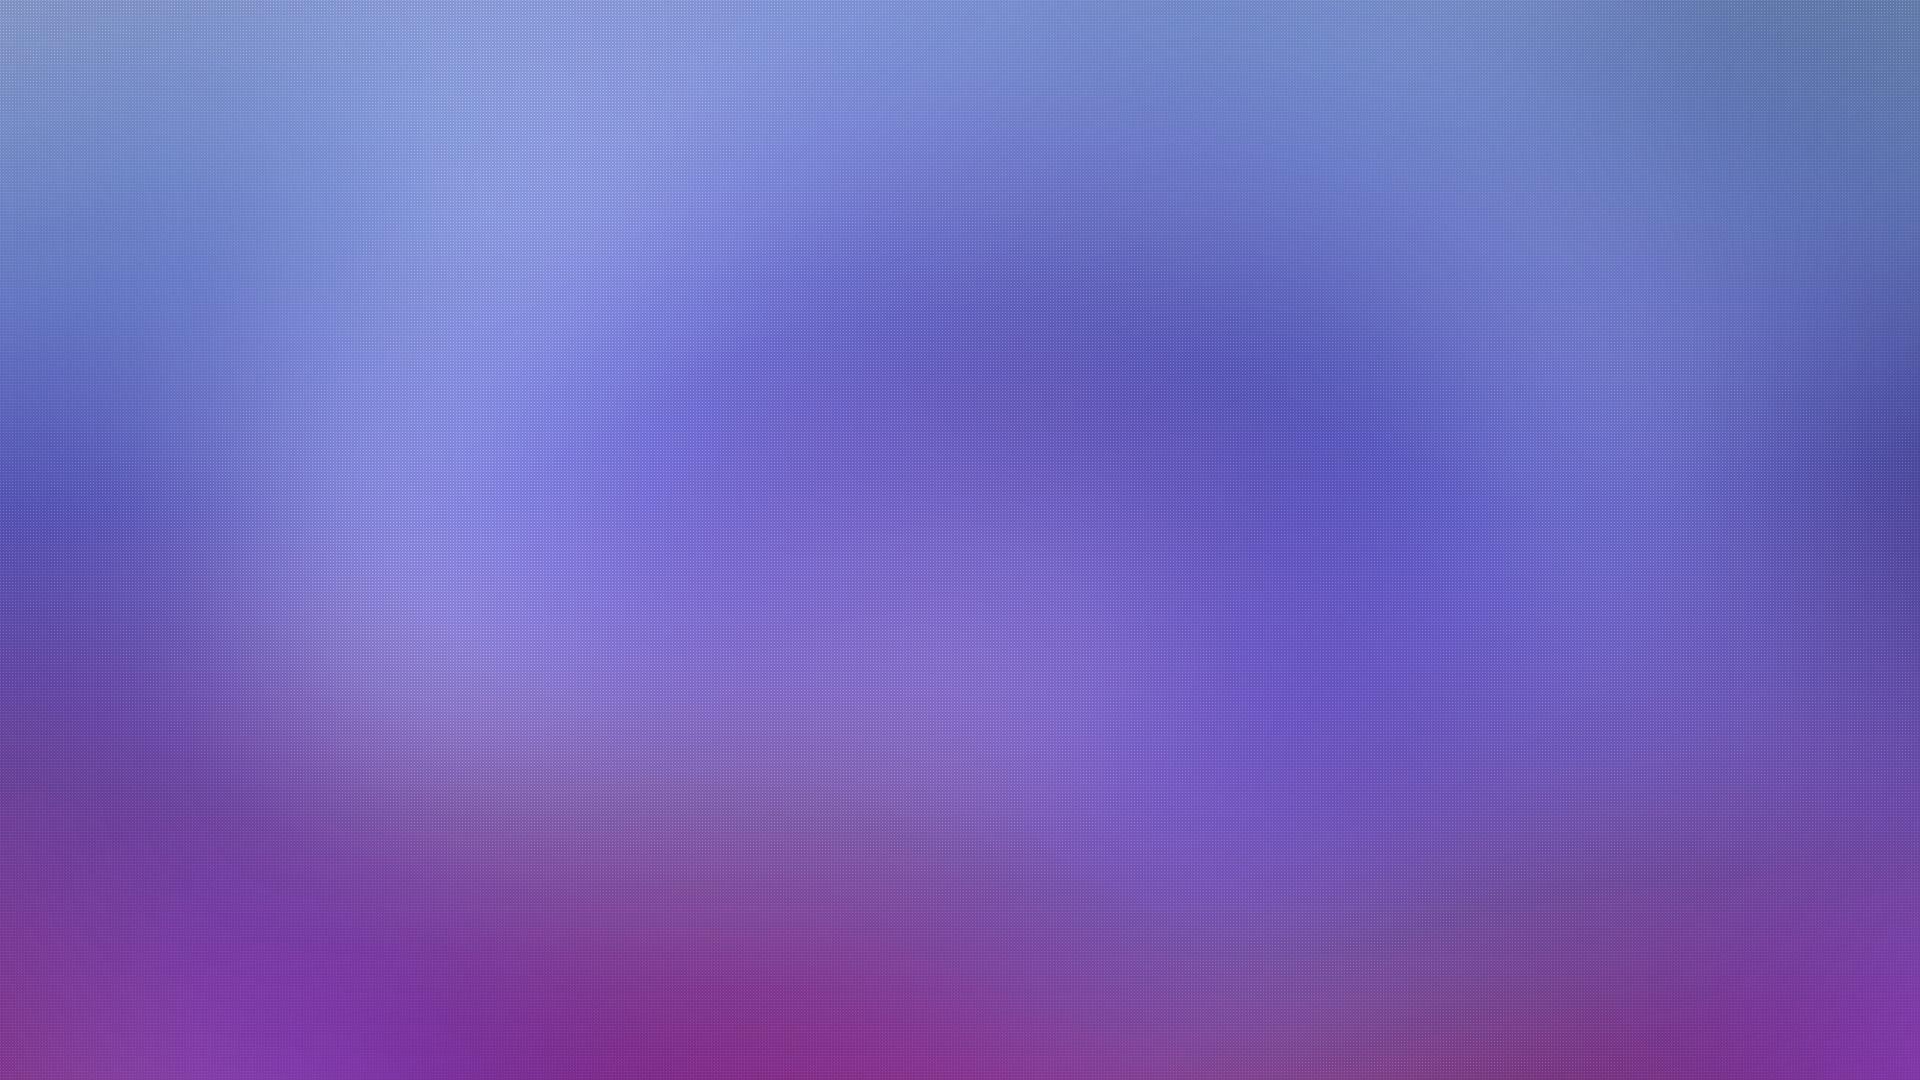 Elegant_Background-1